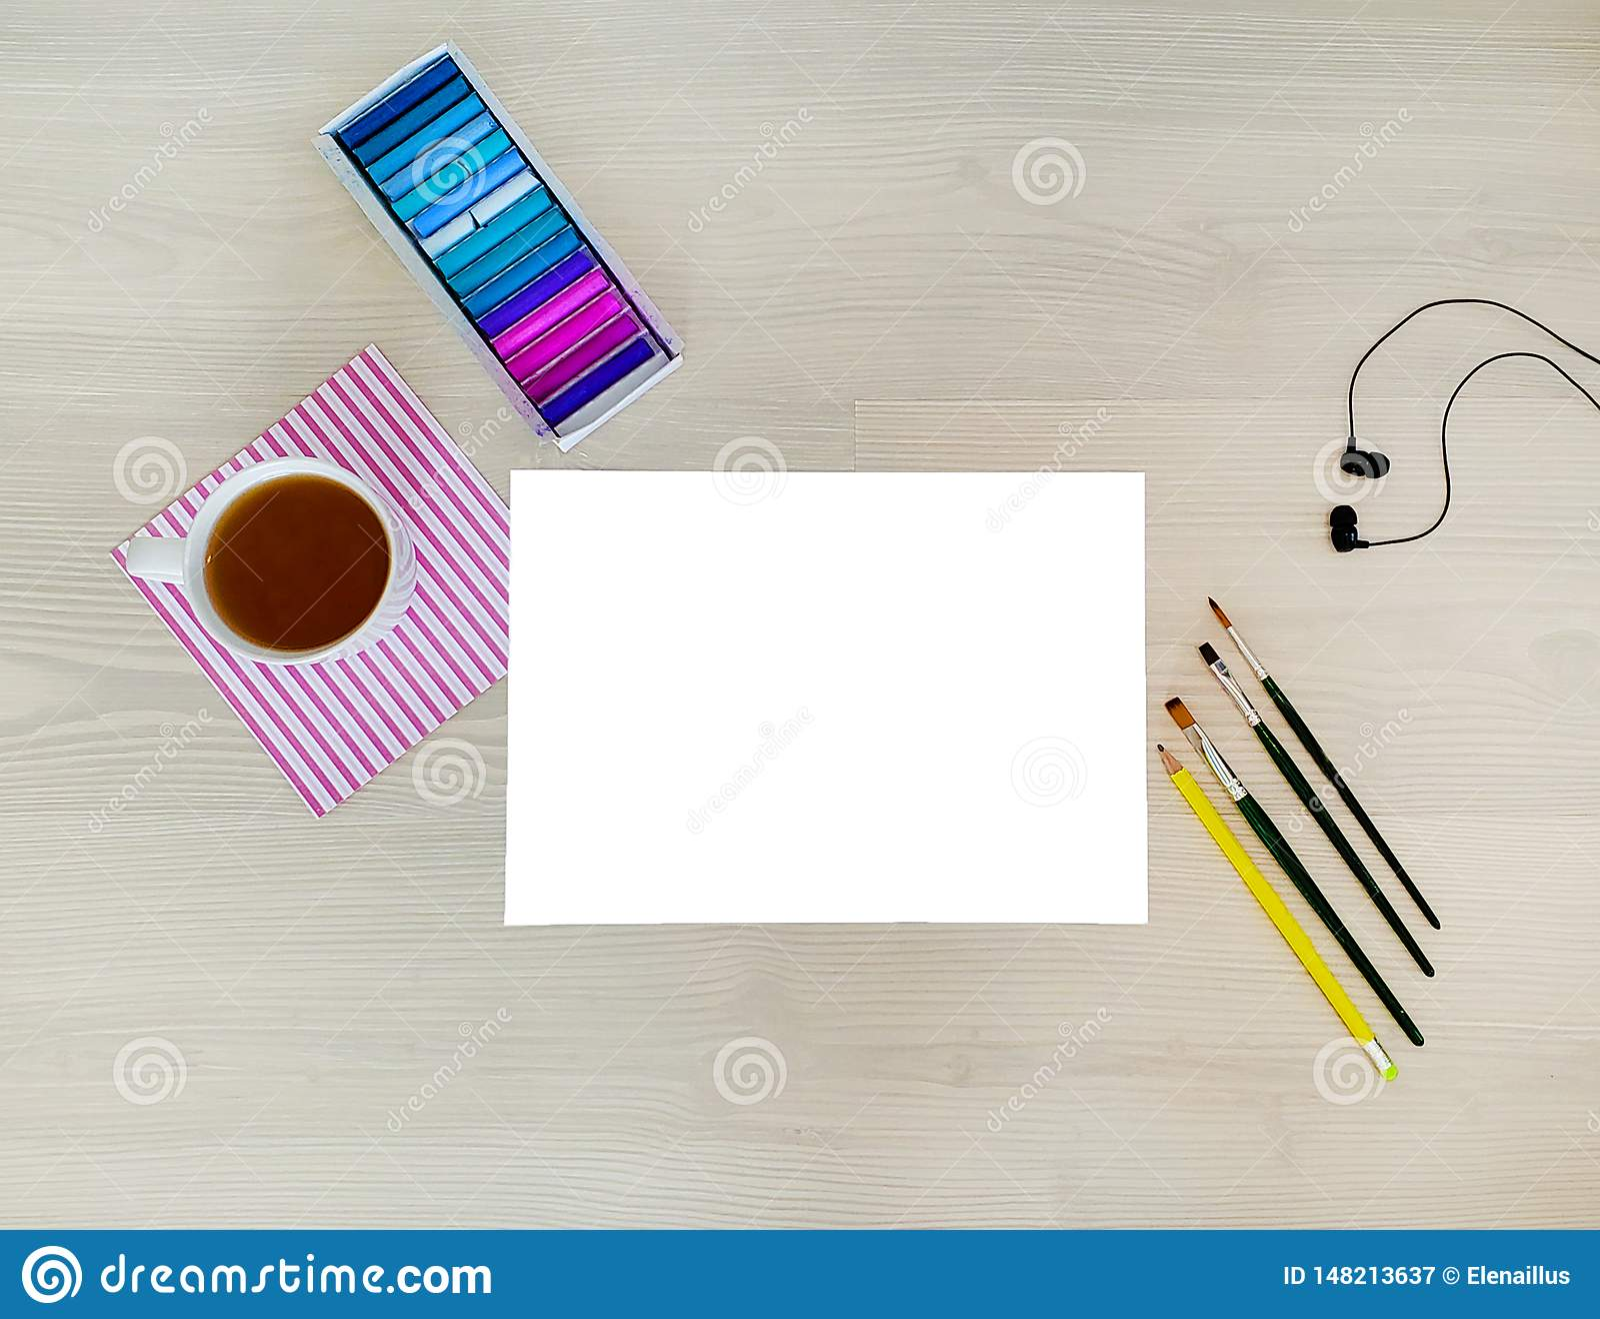 Projektant, artysta miejsce pracy E